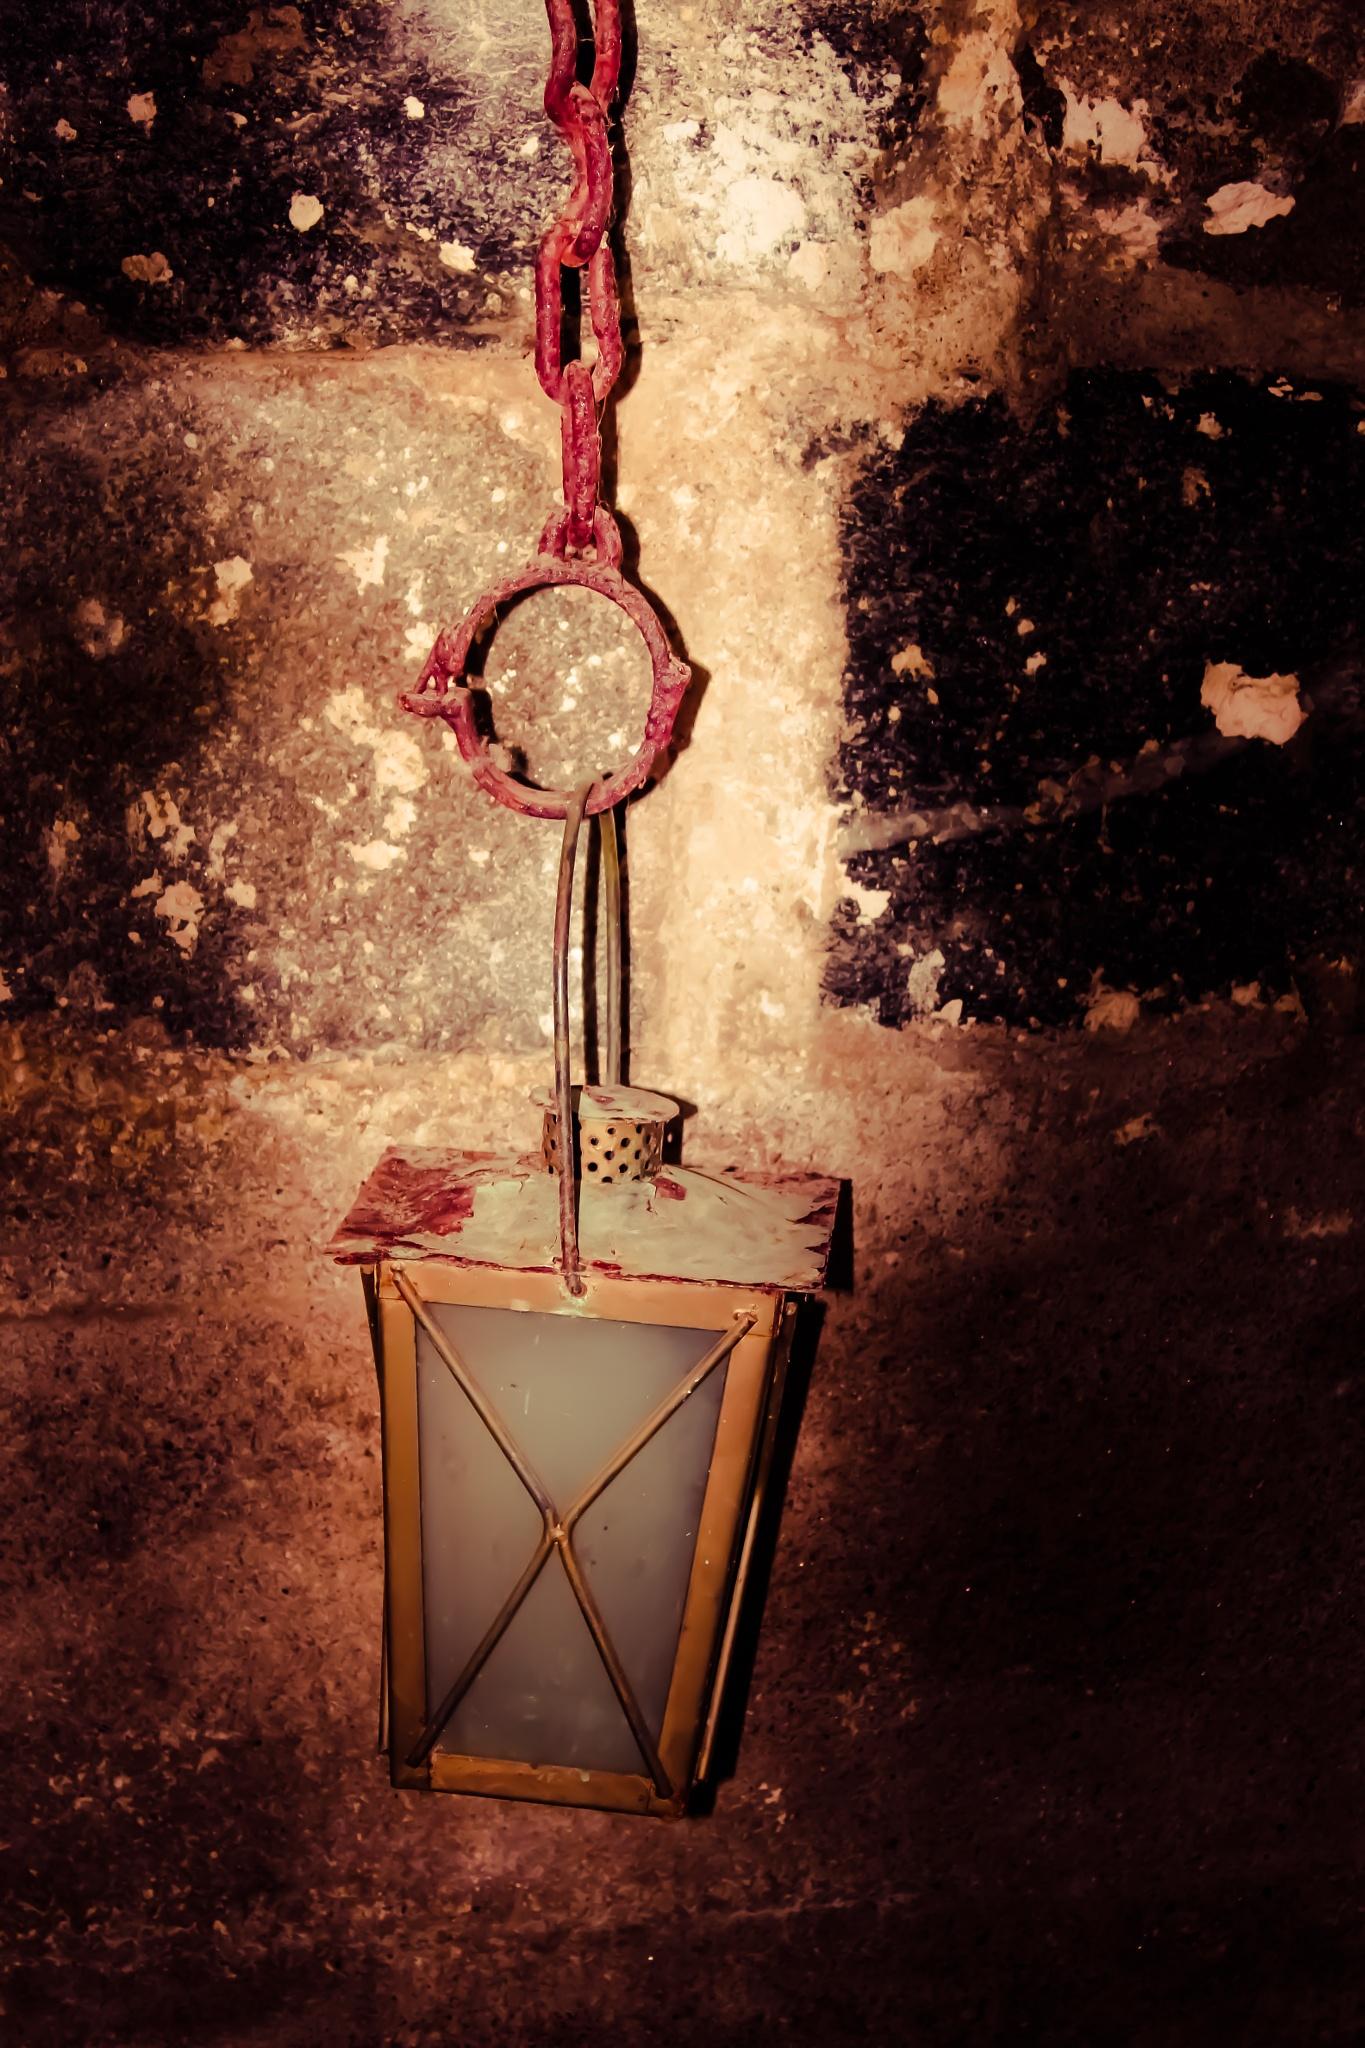 *In case you need light* by Kicka Terho